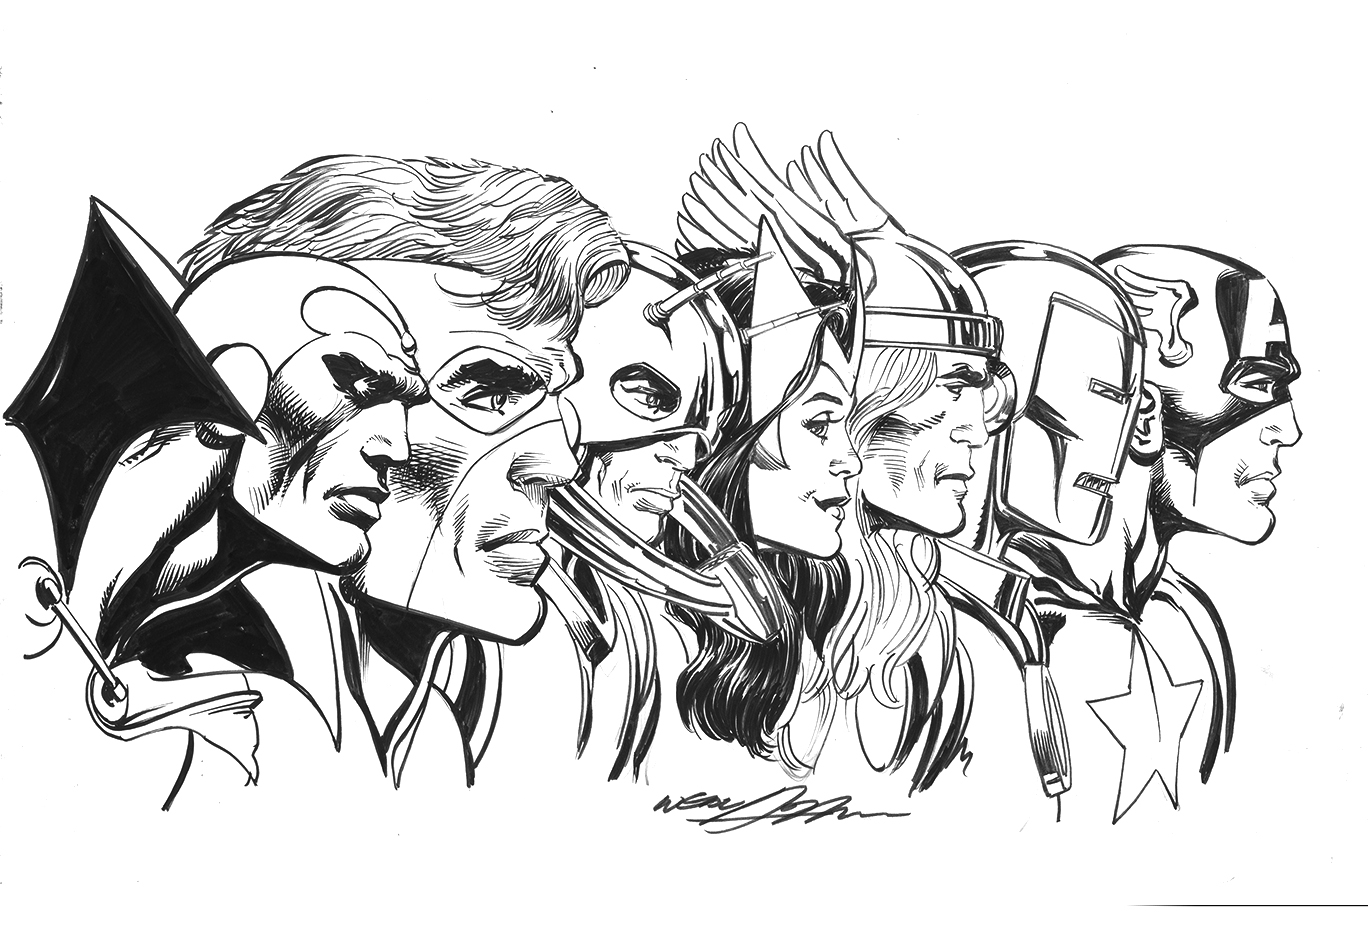 Marbel Imagenes Para Colorear: Avengers Print